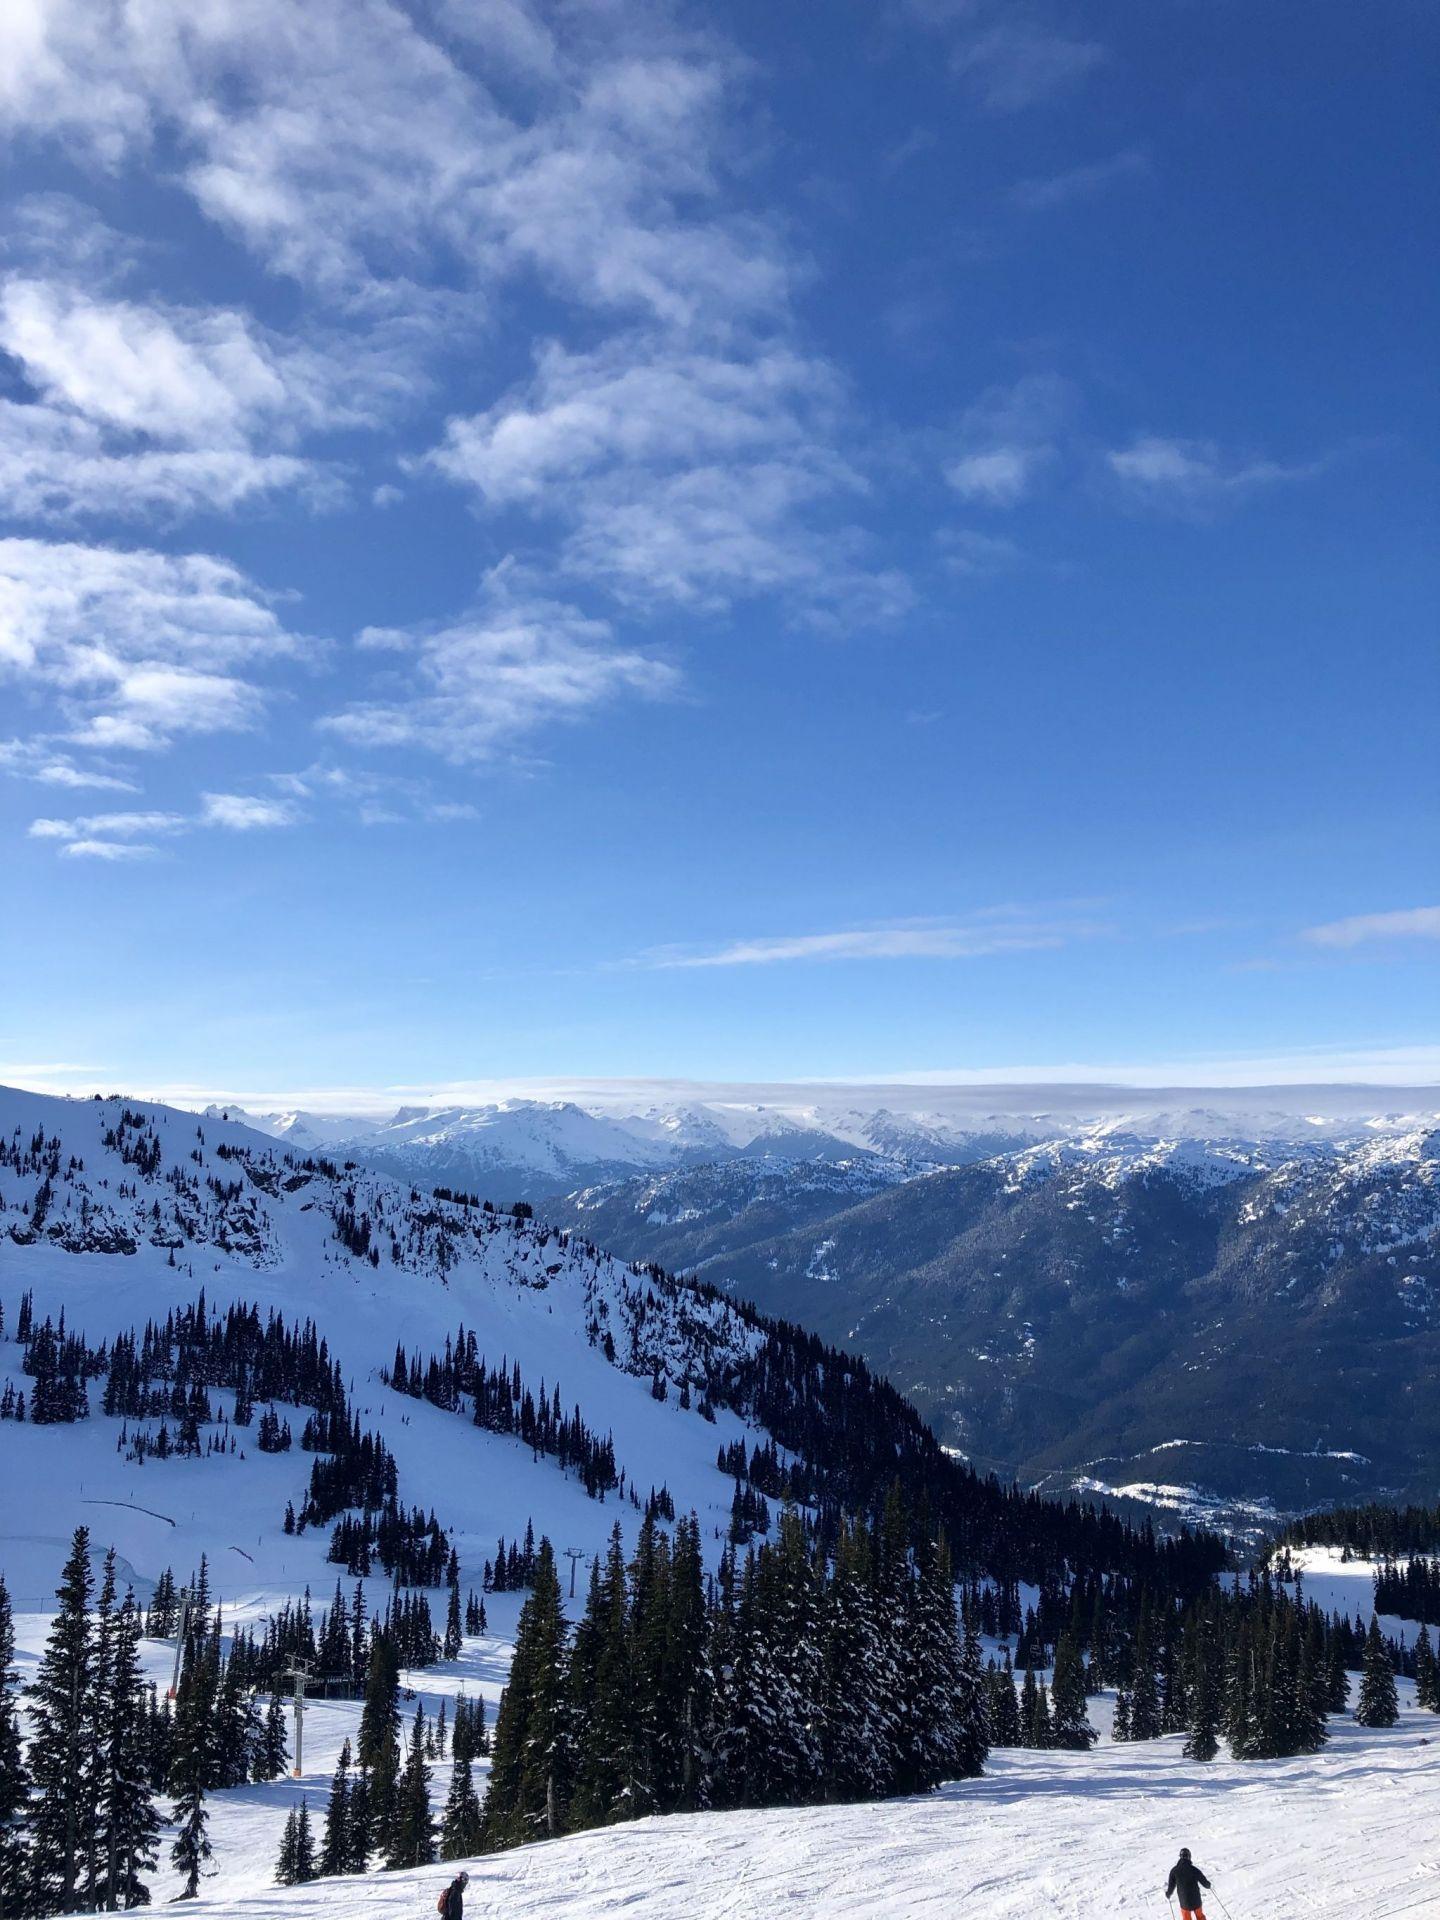 View across Whistler, British Columbia